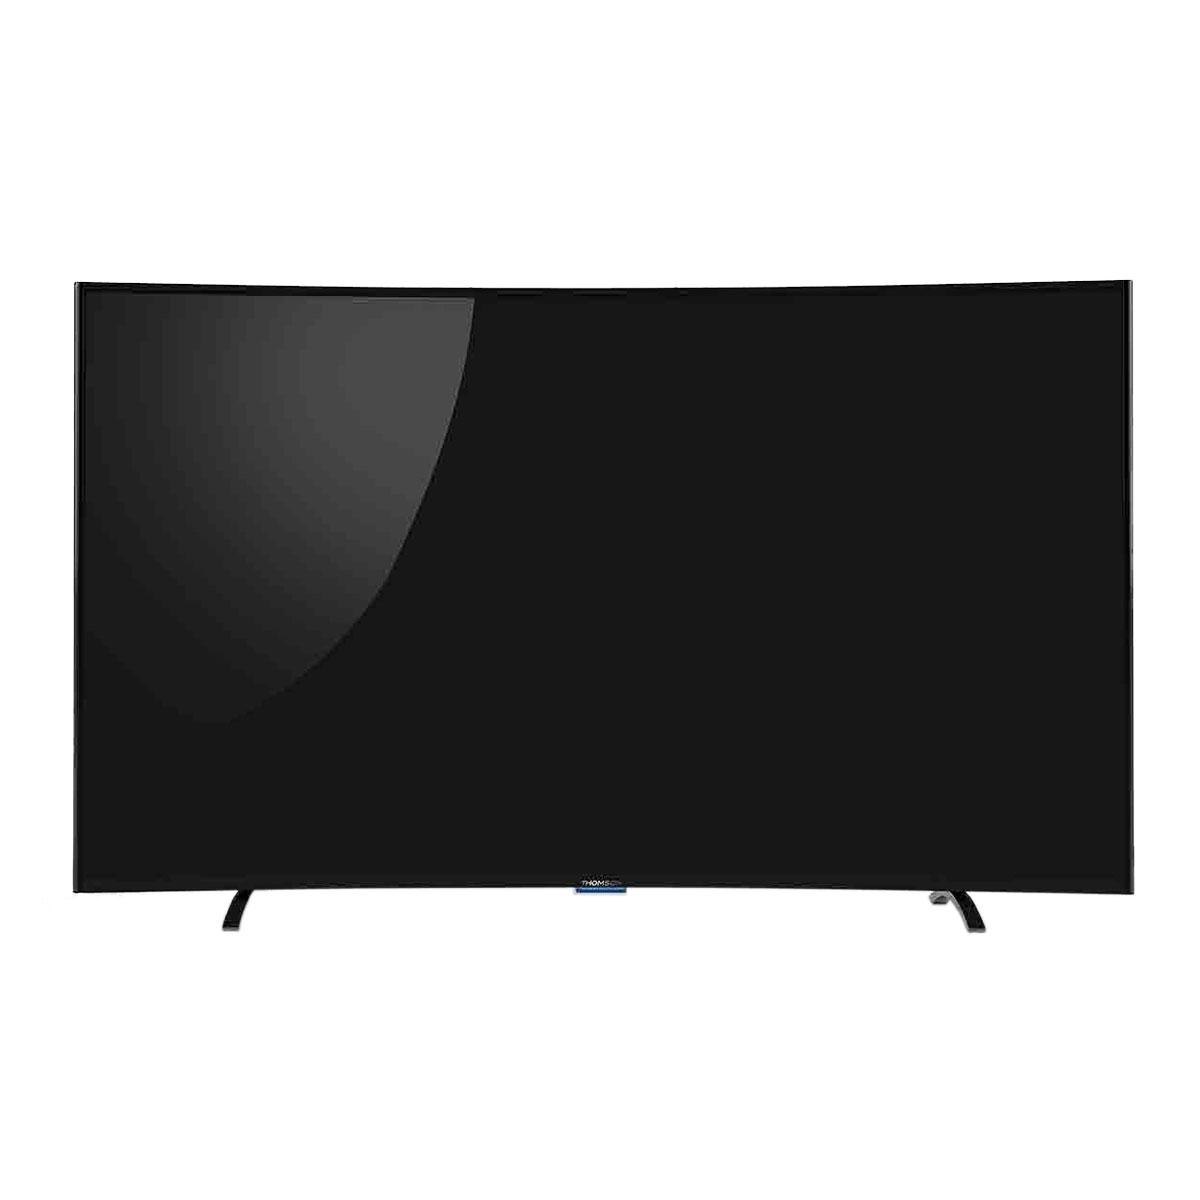 thomson 55ua8596 55ua8596 achat vente tv sur. Black Bedroom Furniture Sets. Home Design Ideas